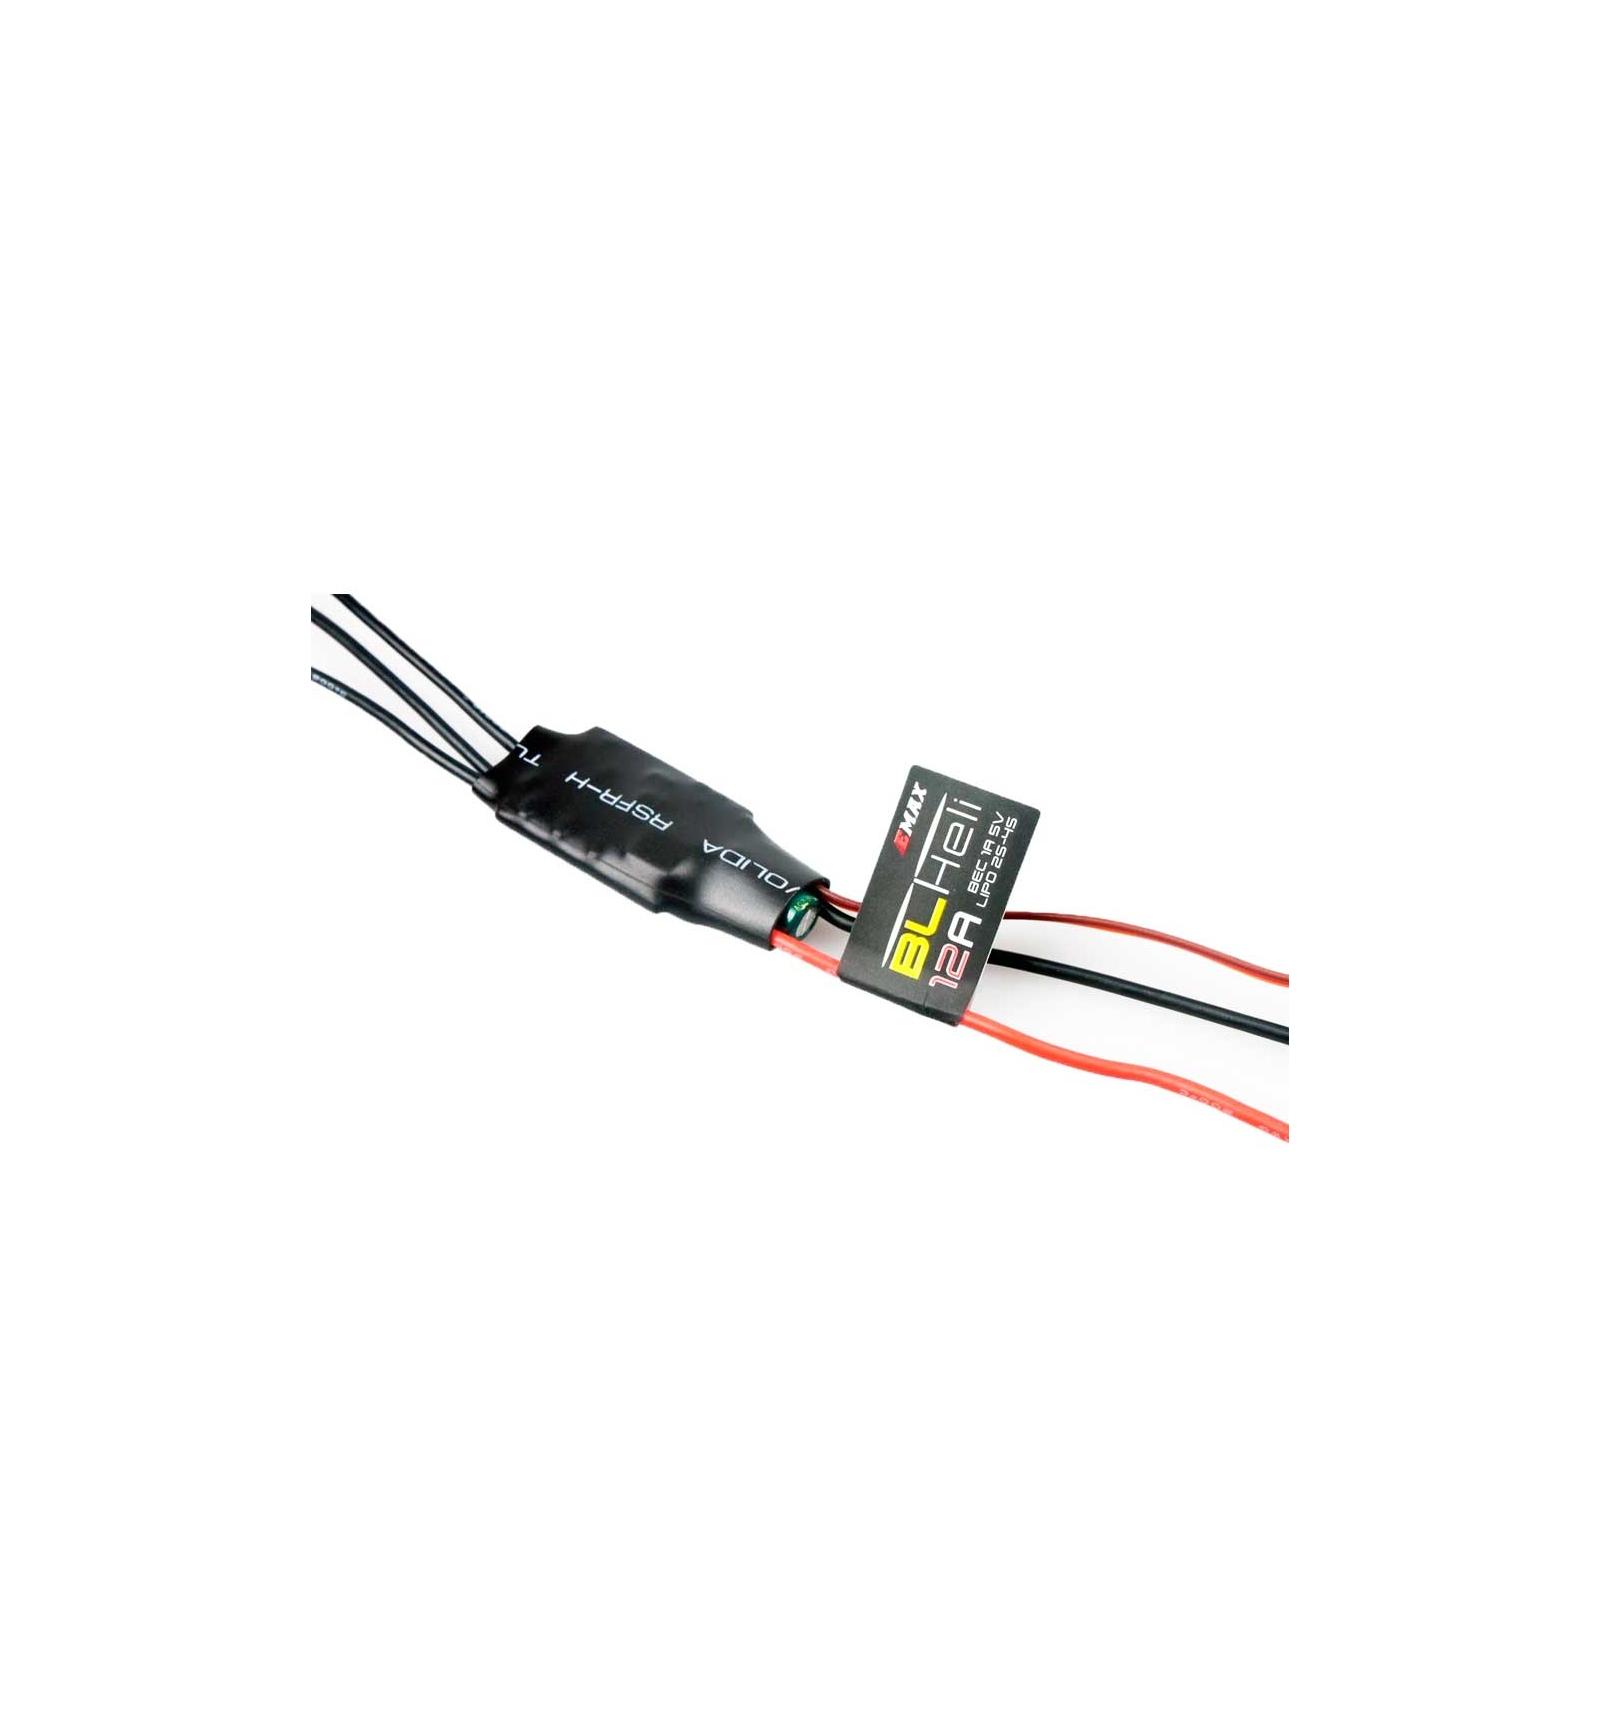 Emax Blheli Series 12a Regulador Brushless Para Radiocontrol Wiring X Y W Multicopteros